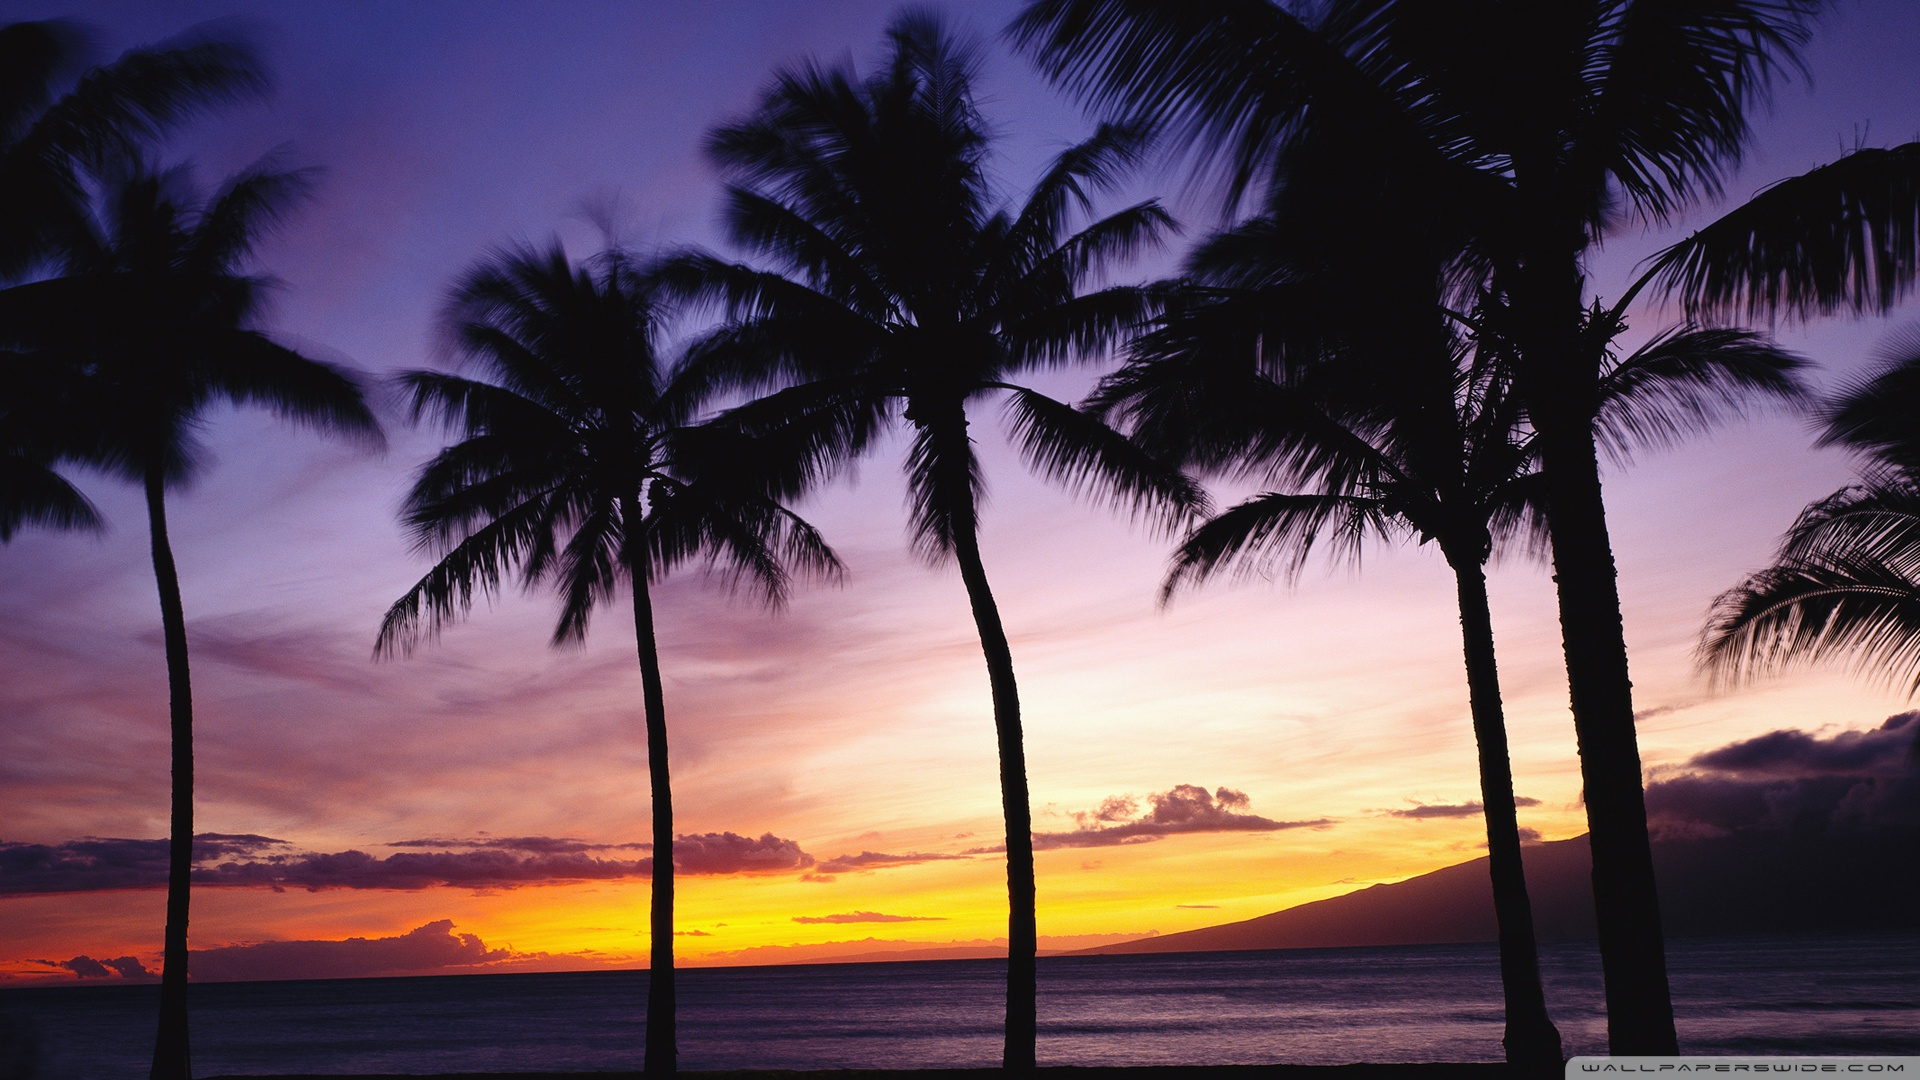 Palm Trees Sunset Wallpaper 1920x1080 Palm Trees Sunset 1920x1080